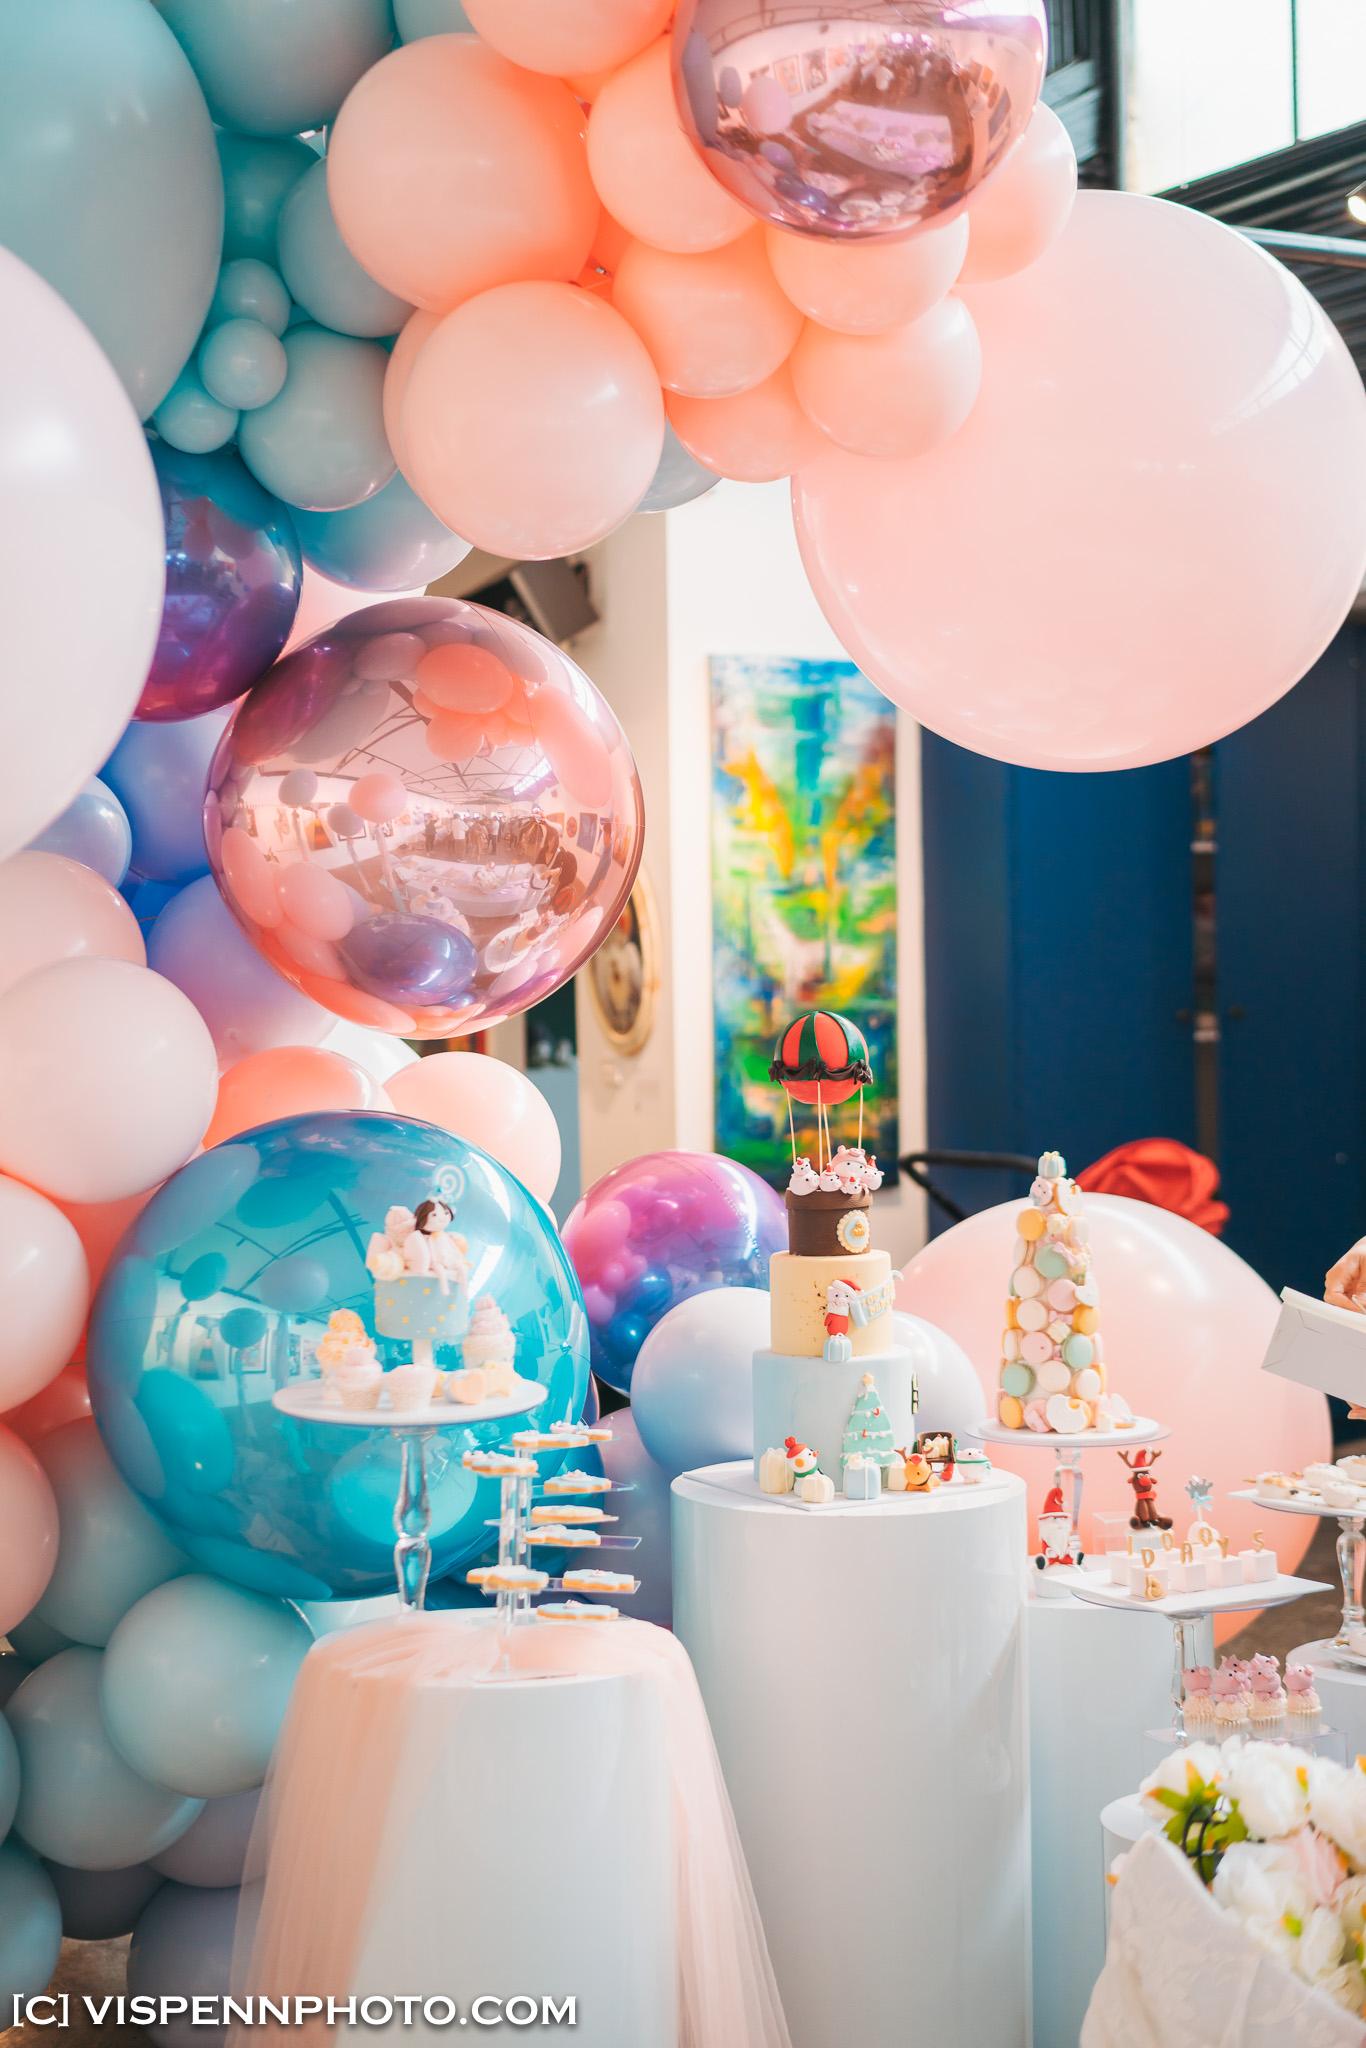 Melbourne Baby Family Birthday Party Photographer 墨尔本 百日宴 满月宴 周岁宴 摄影 VISPENN 100 Days 0123 Sony VISPENN